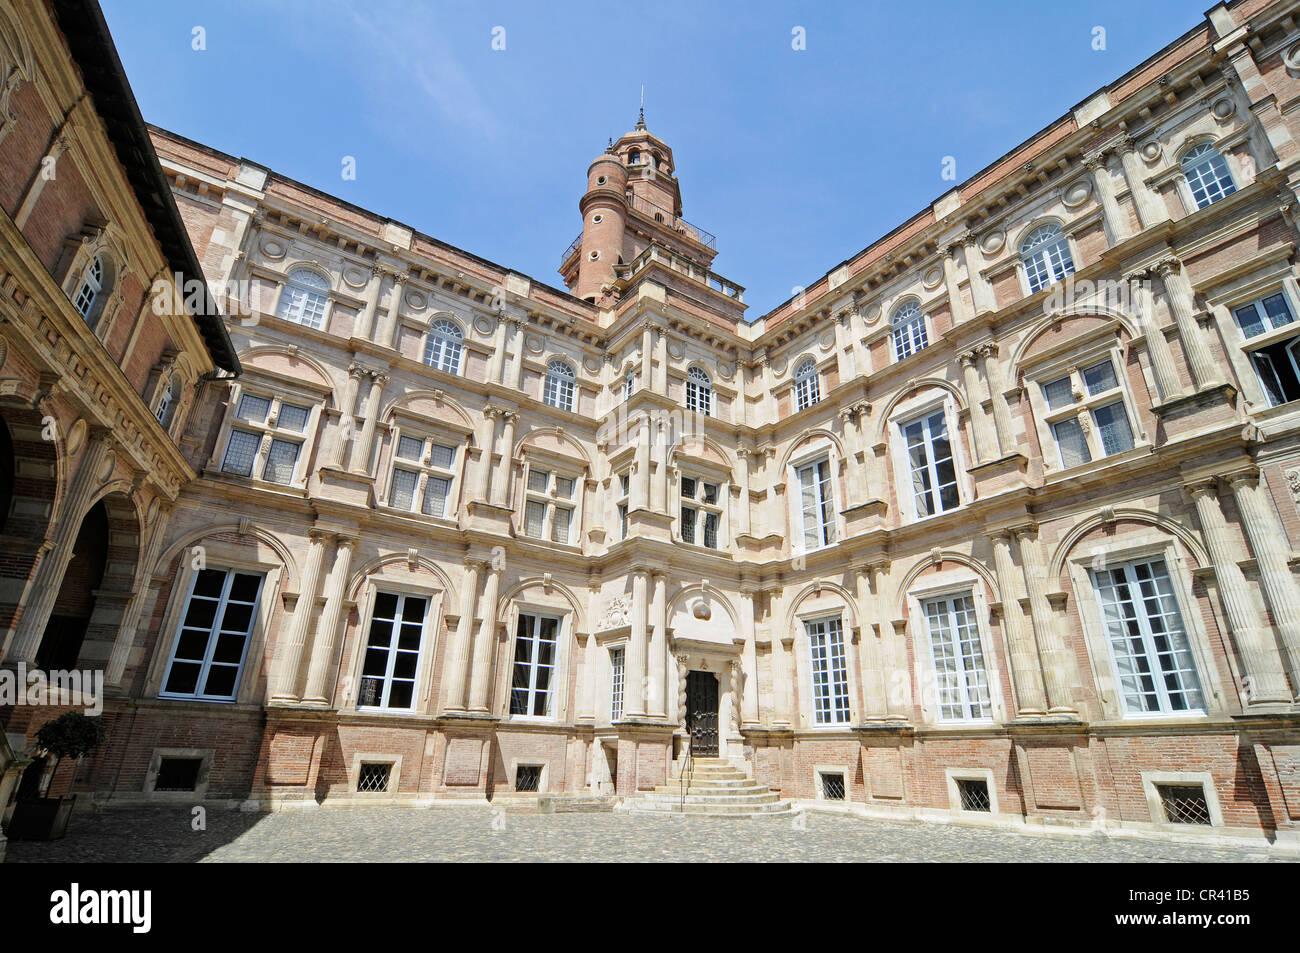 Hotel d'Assezat mansion, home of the Academie des Jeux floraux, Foundation Bemberg, art collection, Toulouse - Stock Image